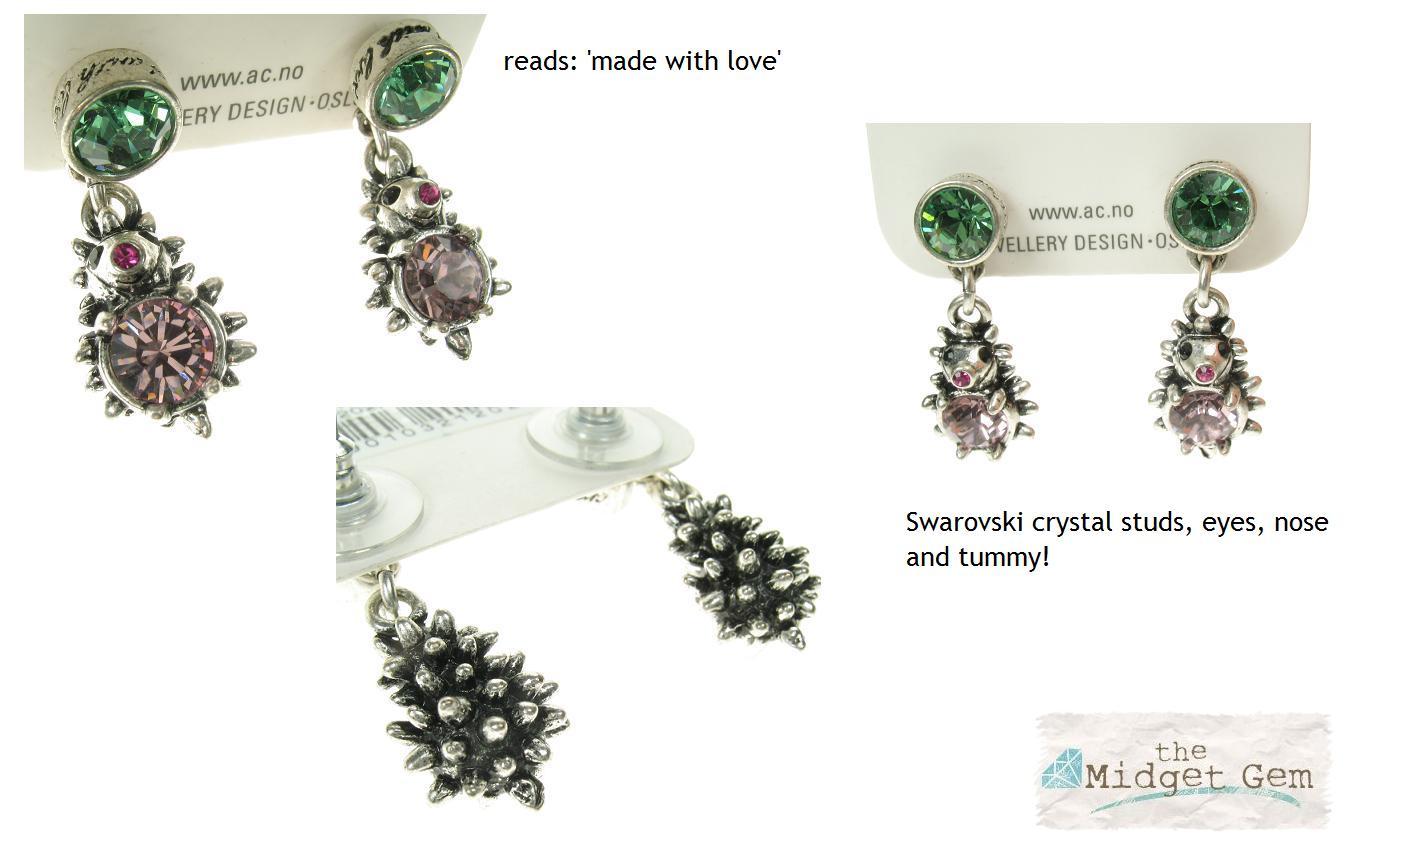 d9df9f7d6 A & C Hedgehog & Swarovski Crystal Earrings